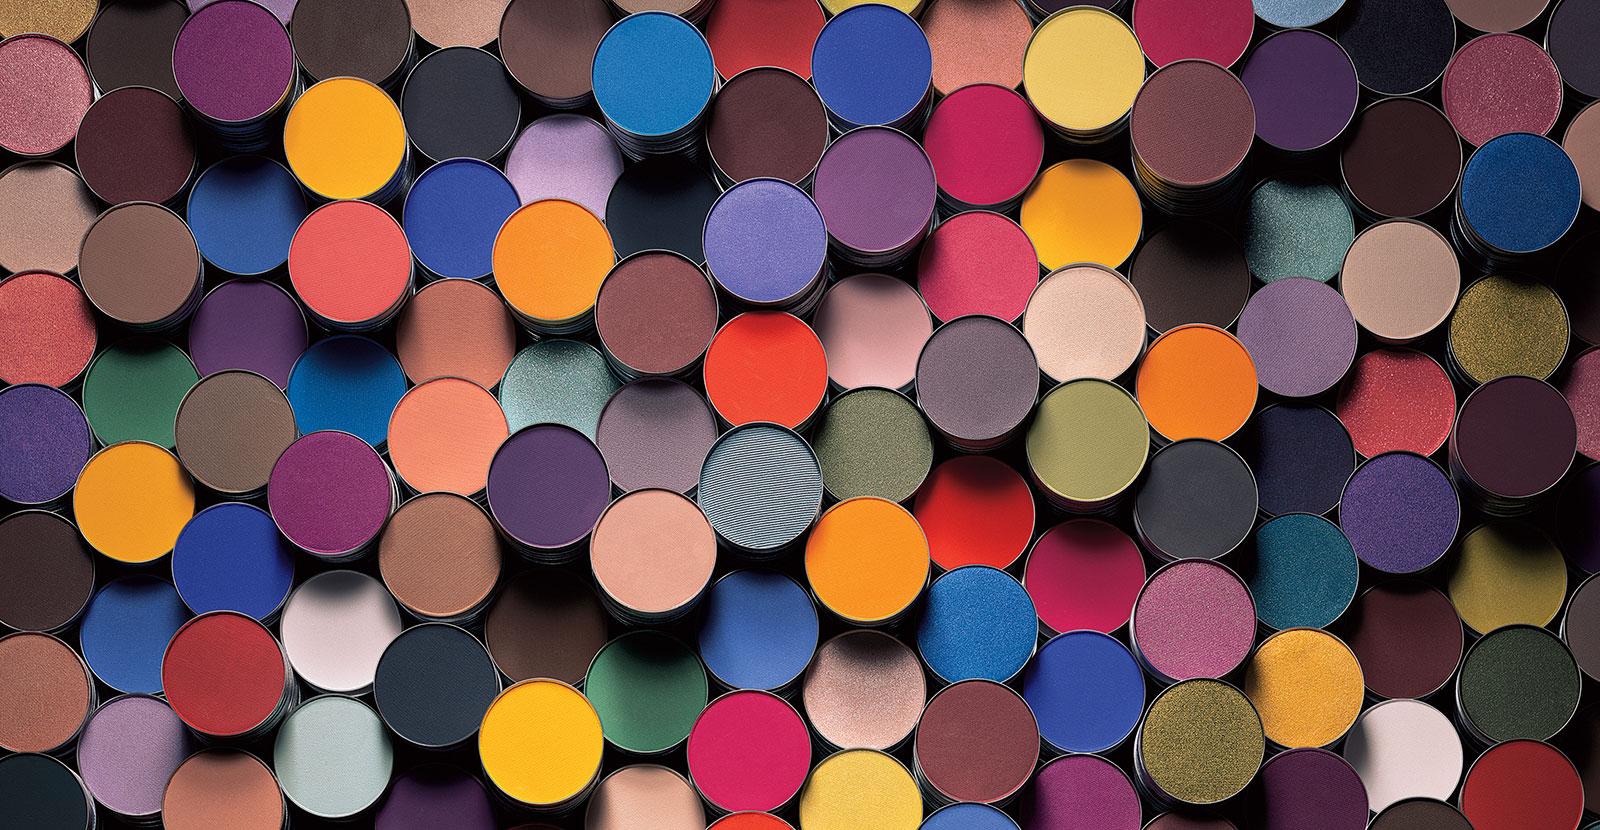 MAC cosmetics – fard à paupières de couleur – Dealabs